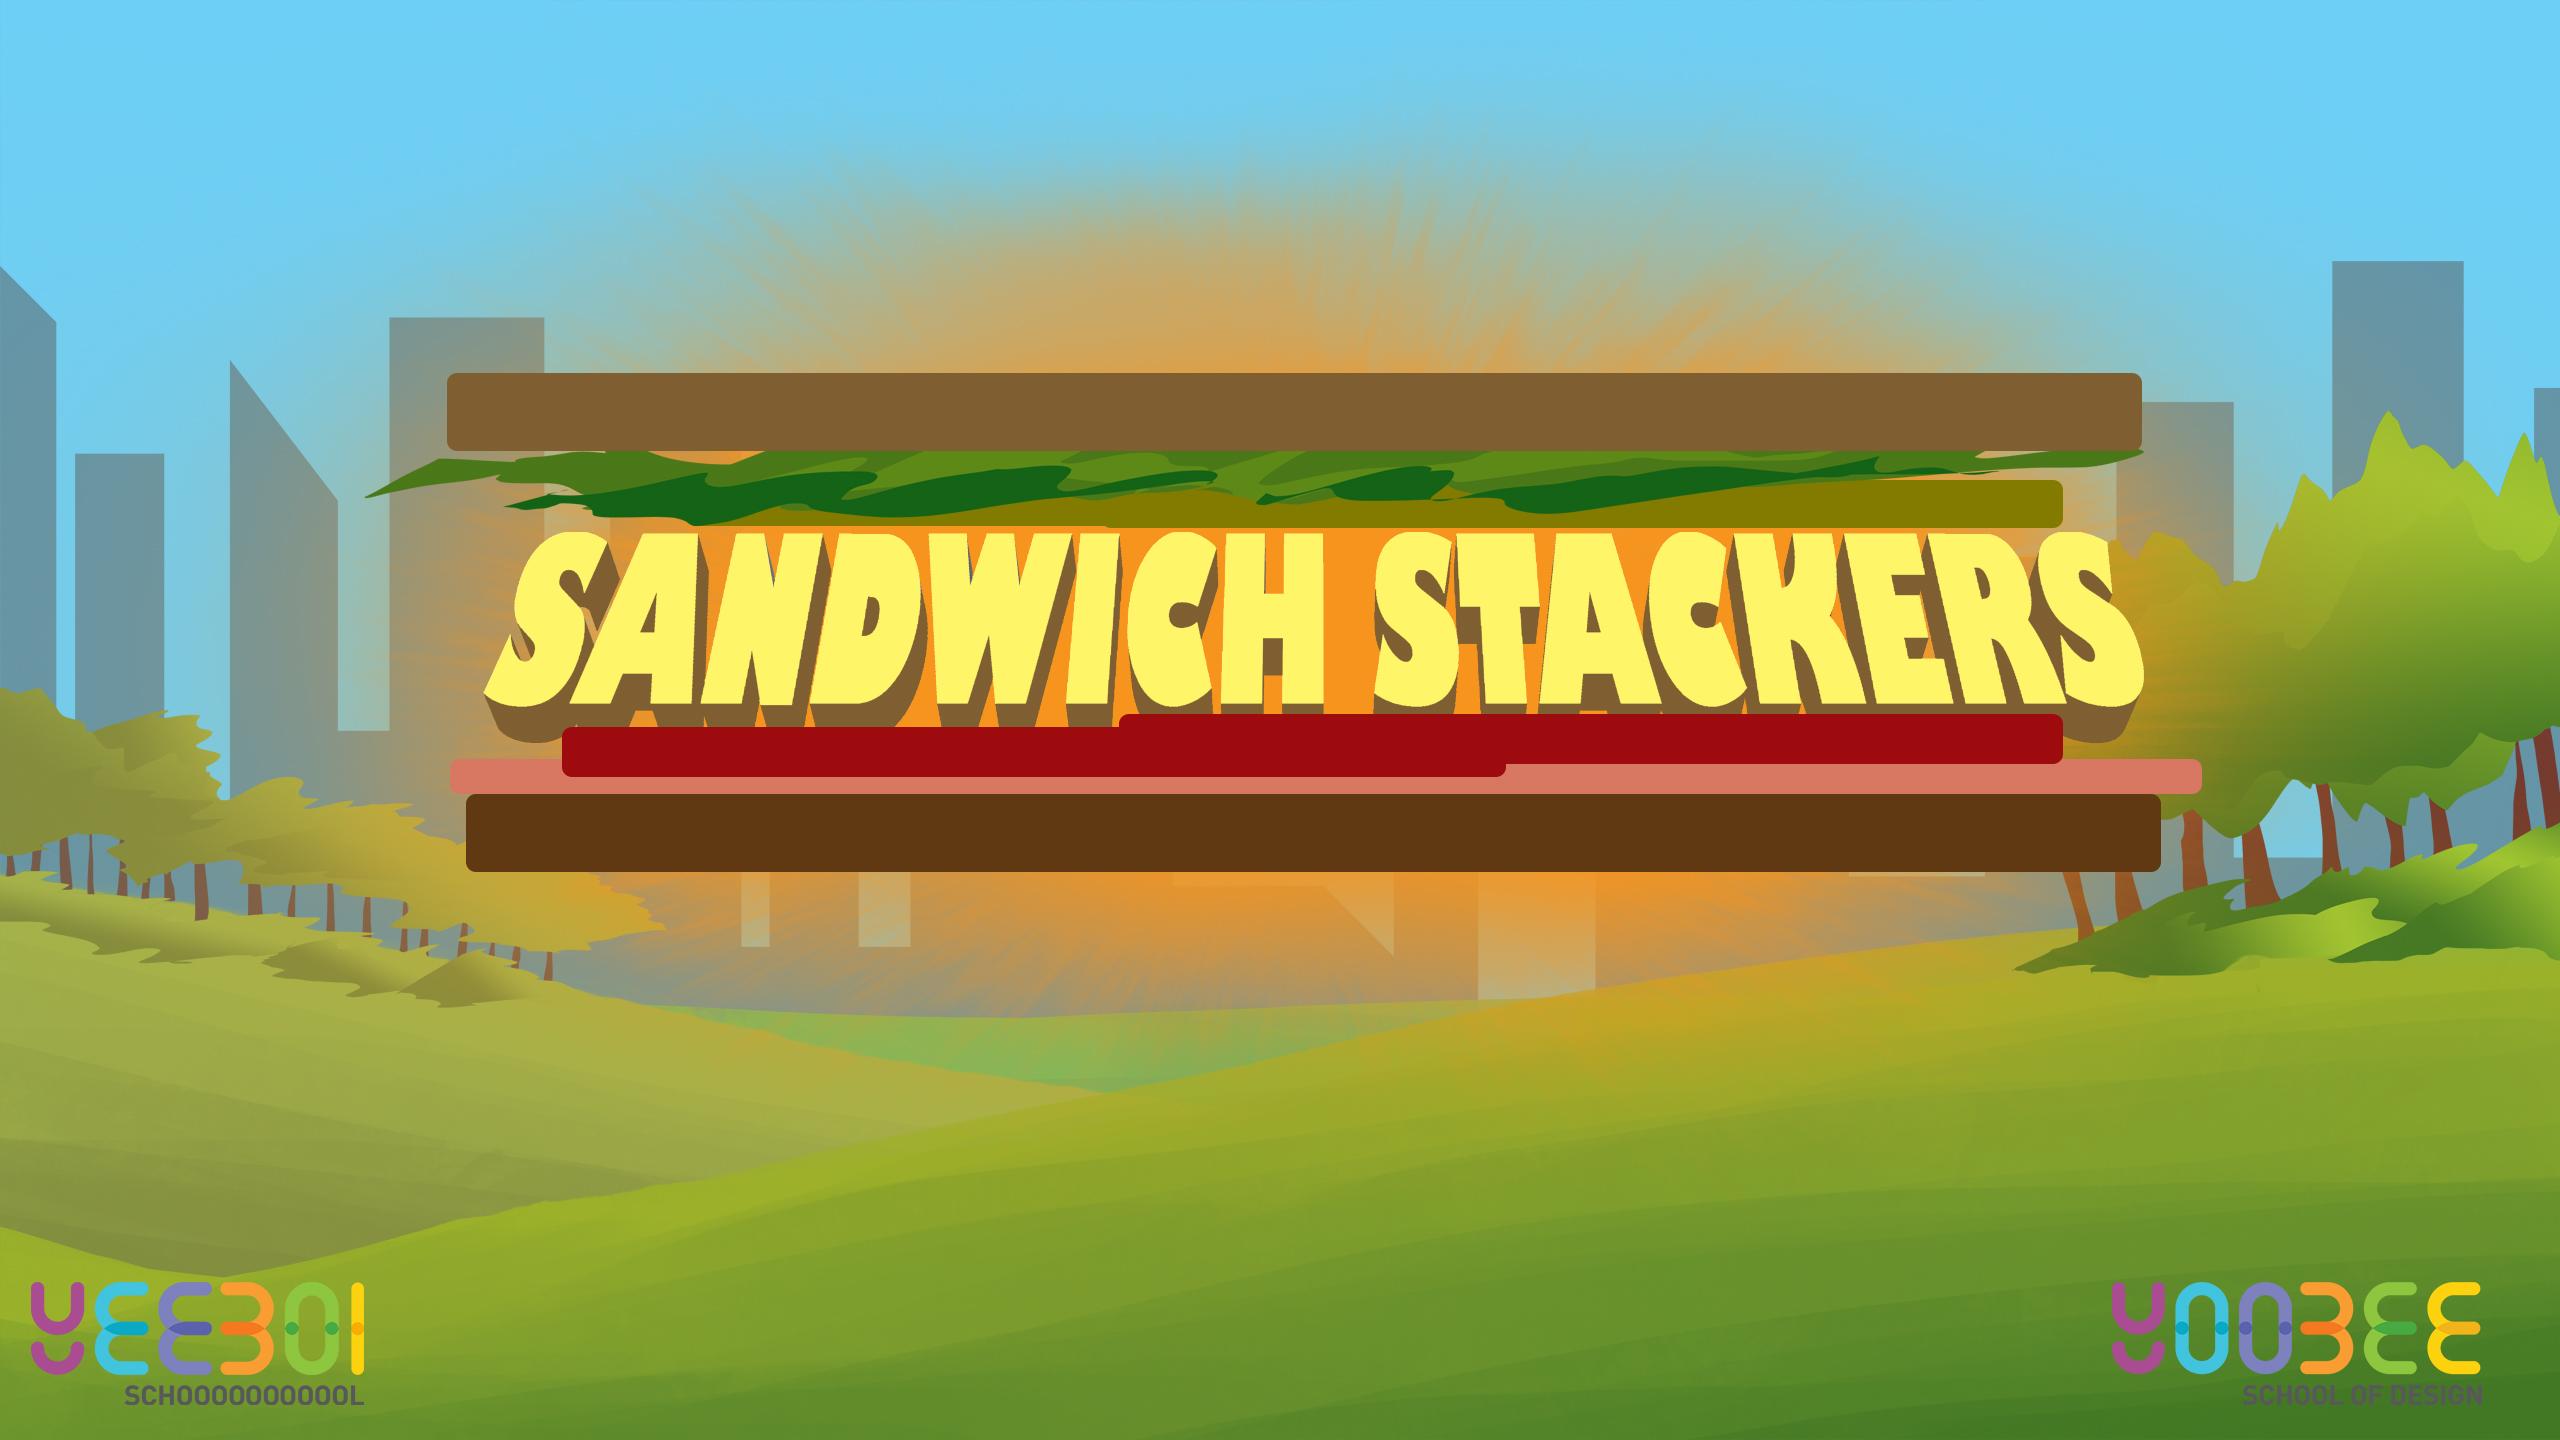 Sandwich Stackers